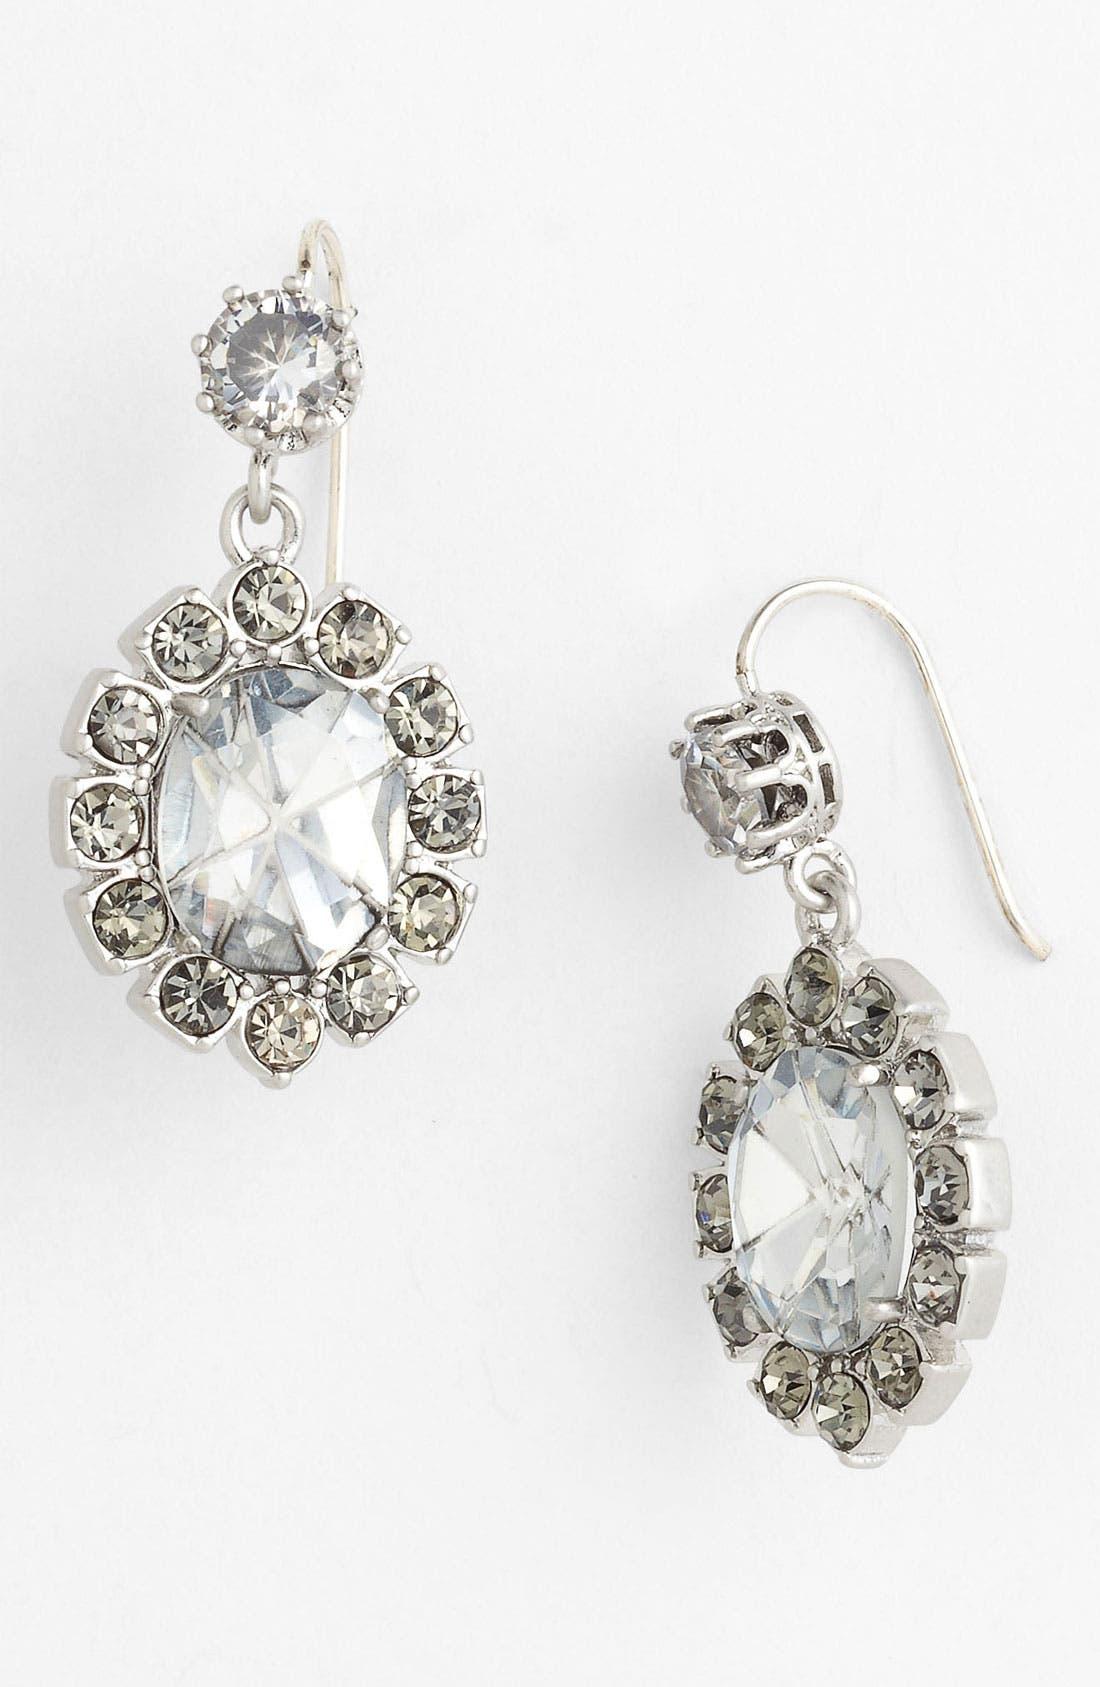 Main Image - Juicy Couture 'Punk Rocks' Drop Earrings